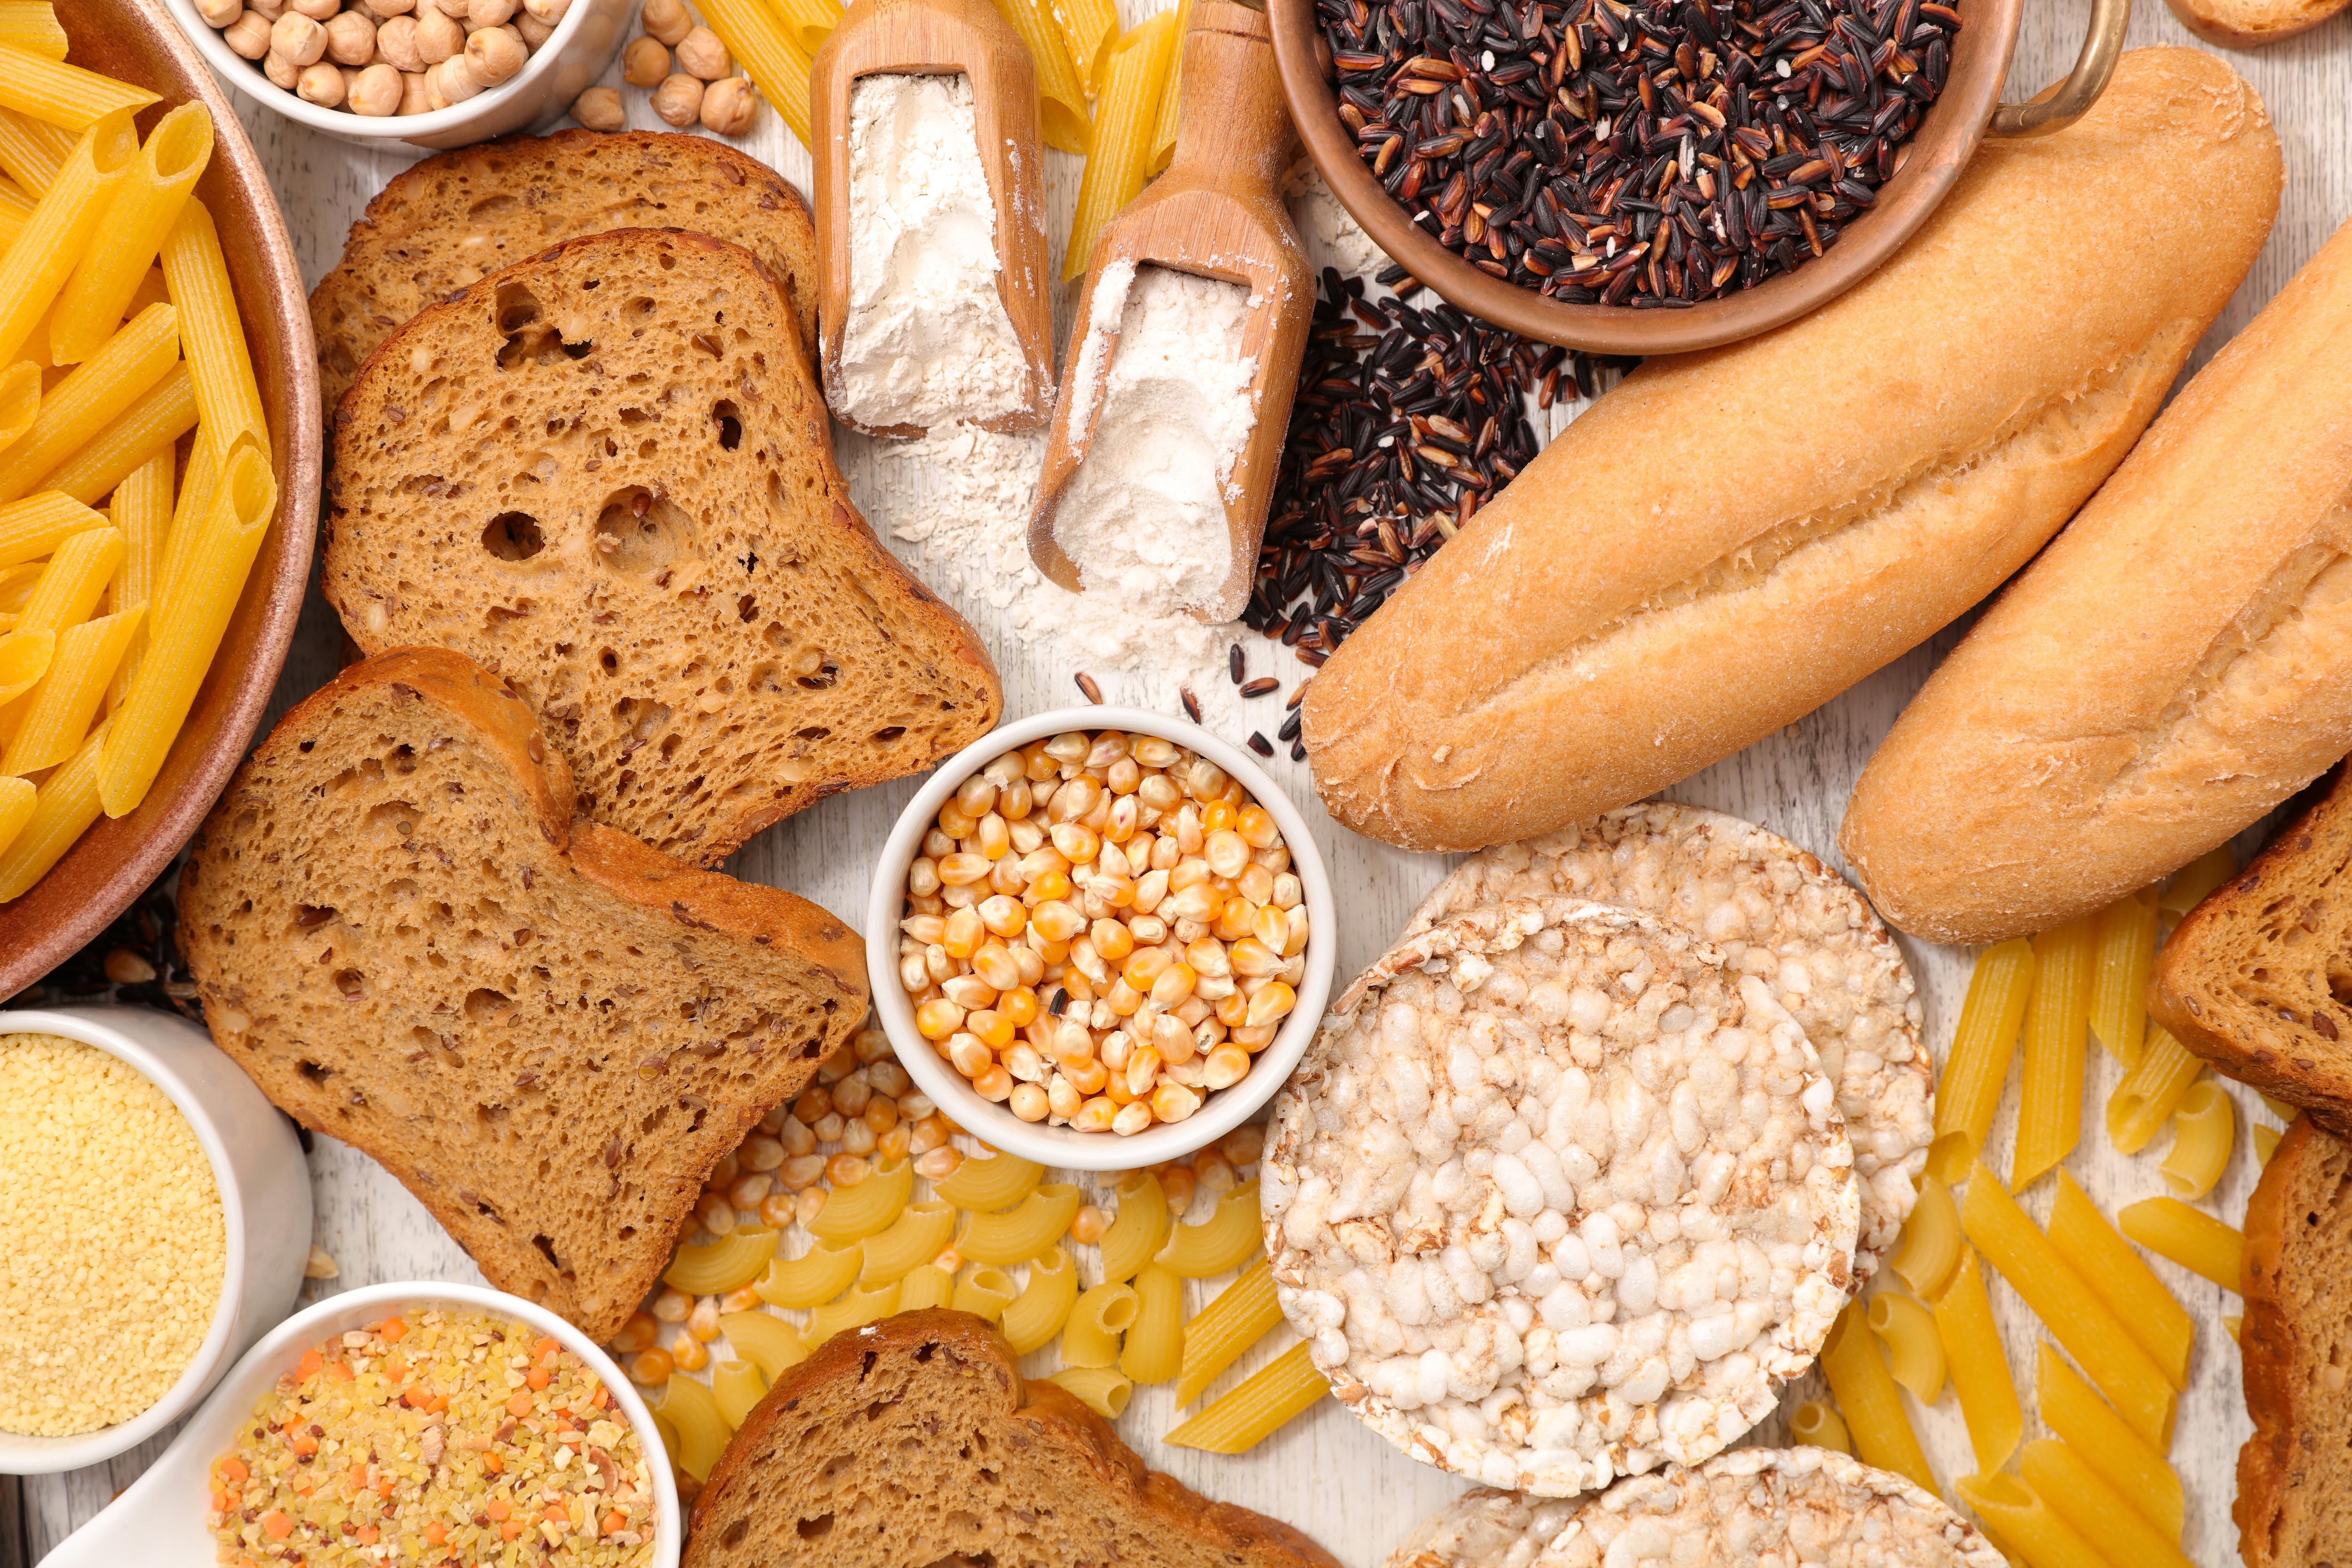 The benefits of a gluten-free diet